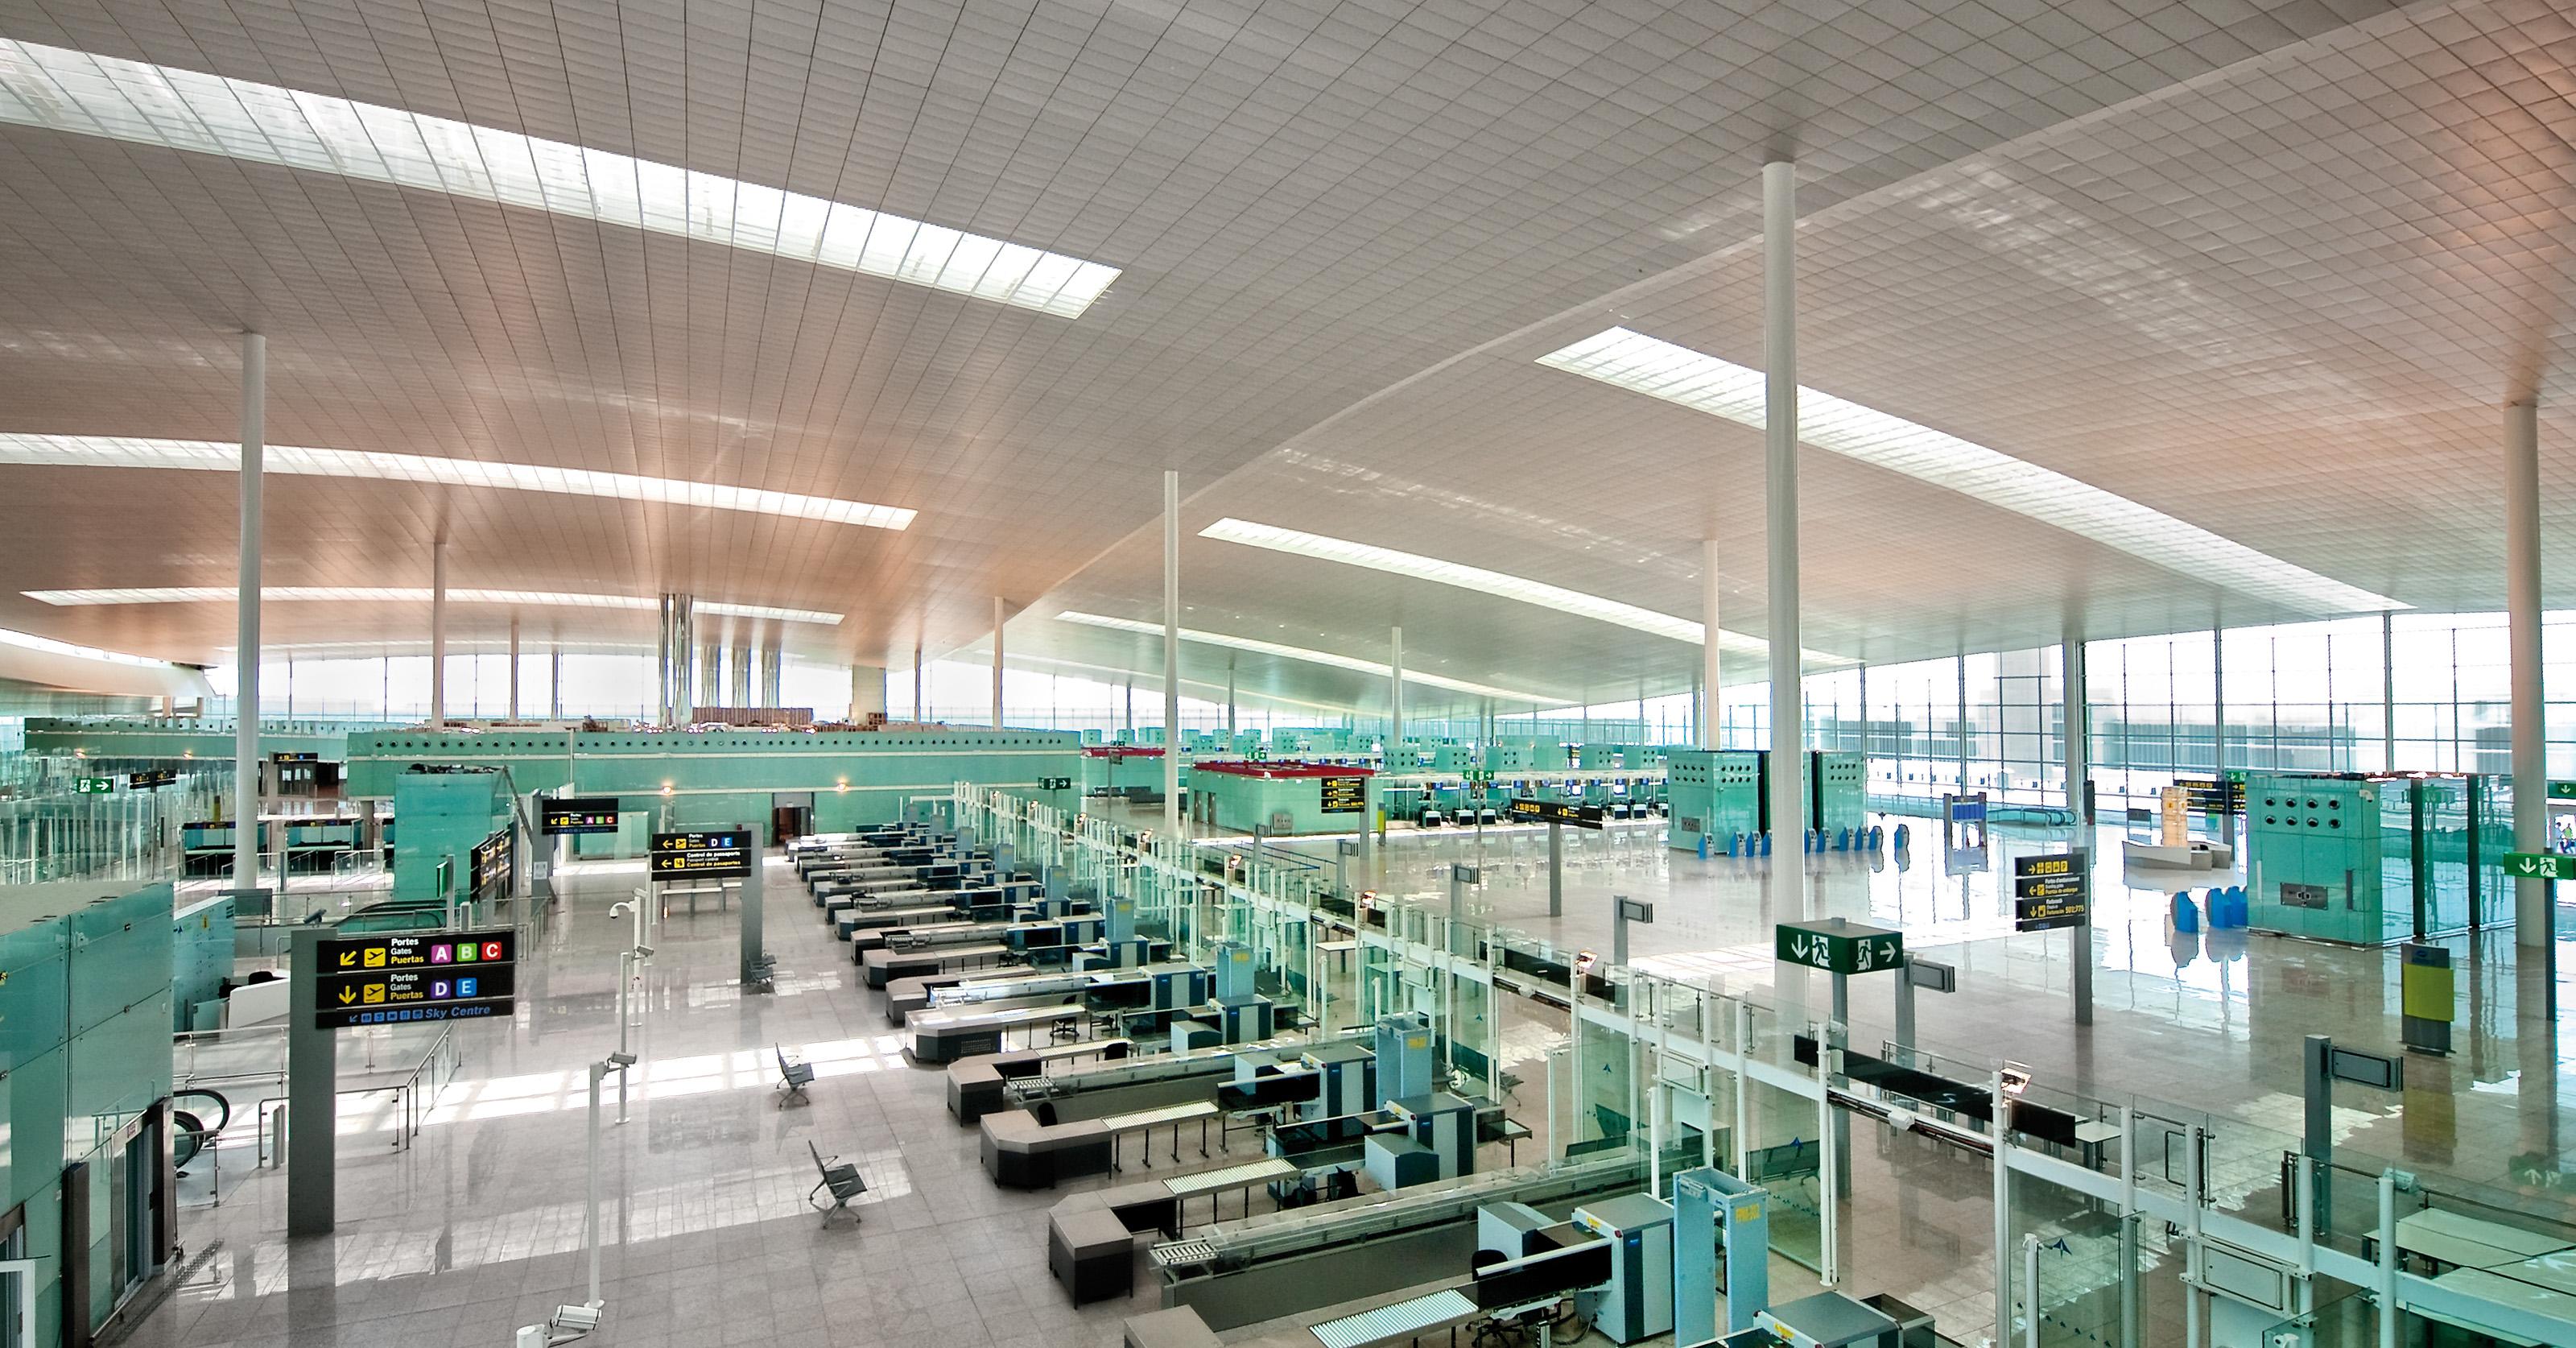 Aeroport De Barcelone Vers Centre Ville Prix